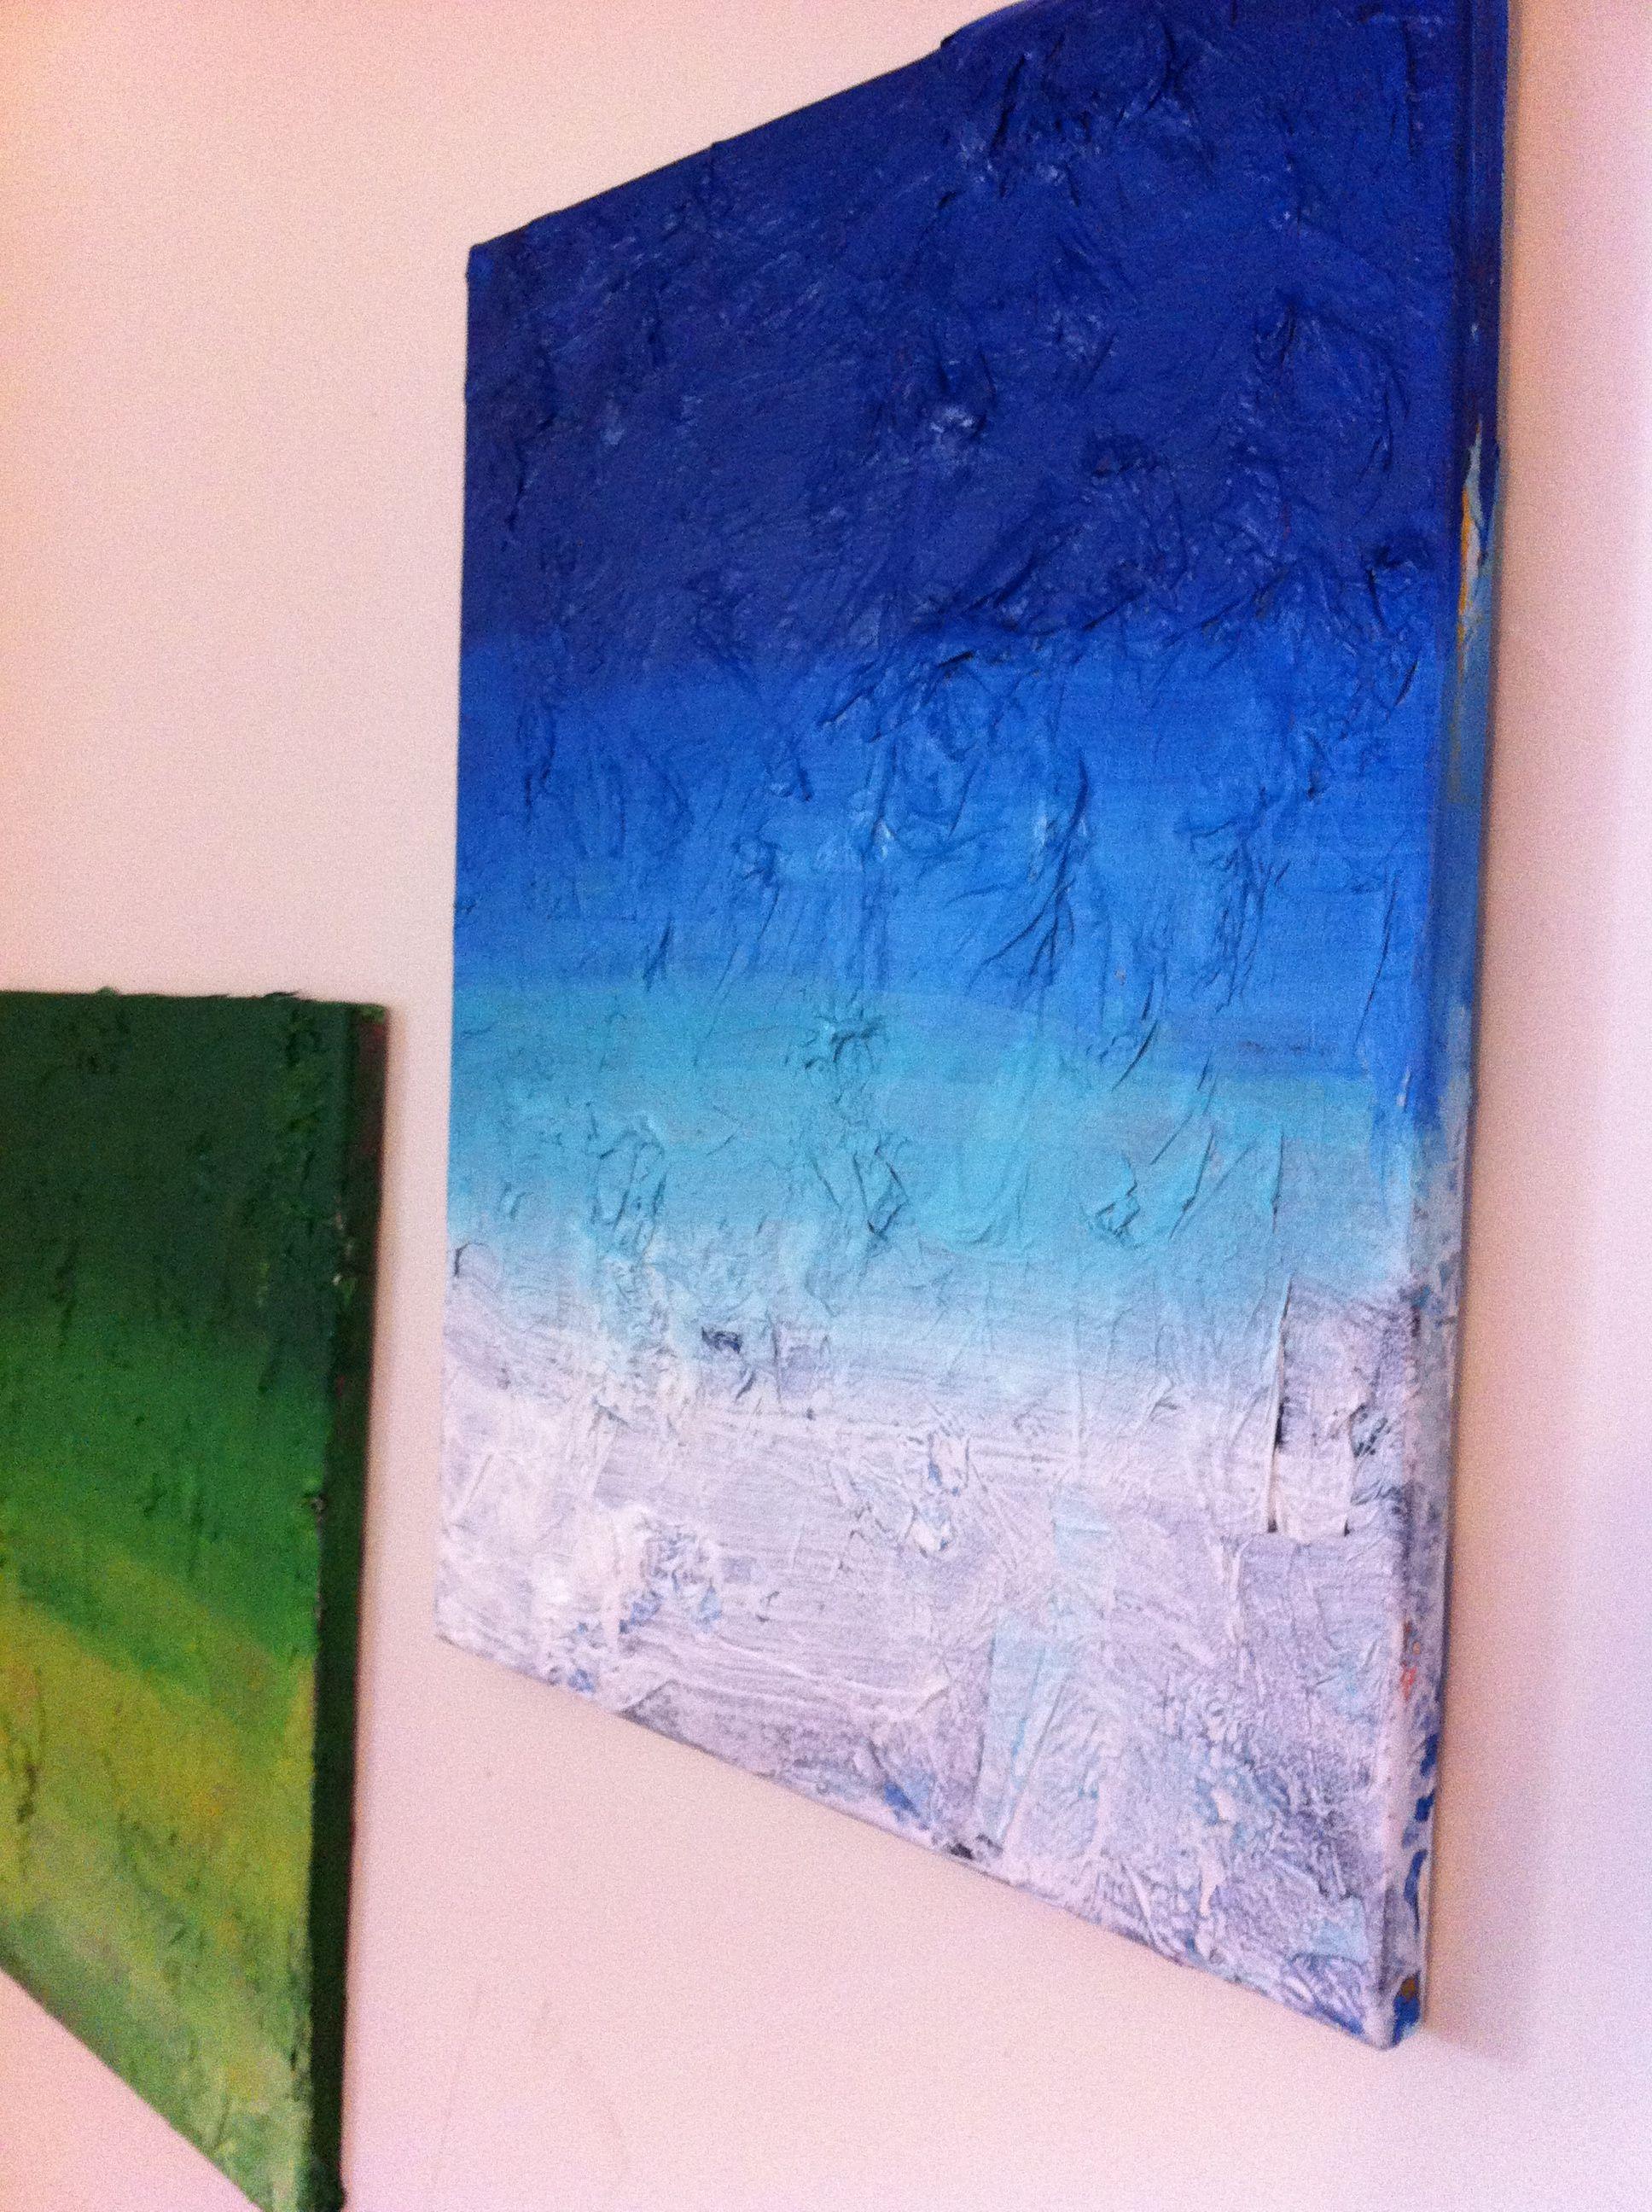 mod podge tissue paper on canvas then ombré painted